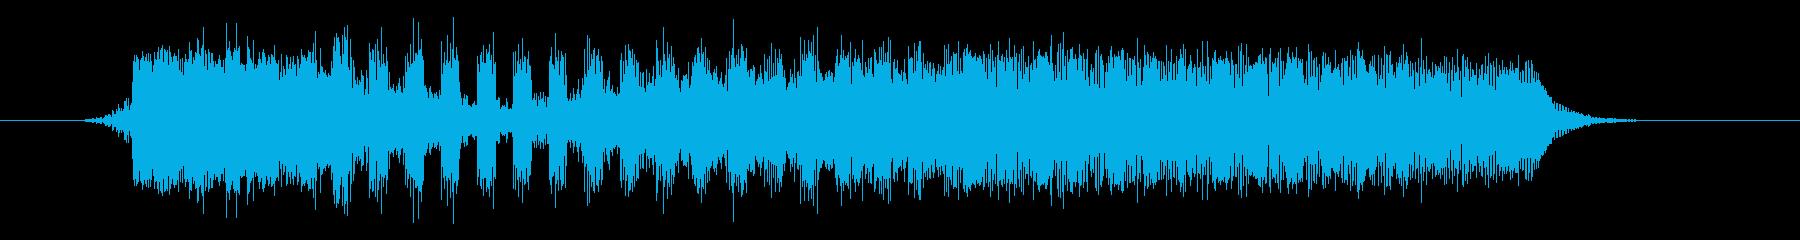 AMGアナログFX 46の再生済みの波形